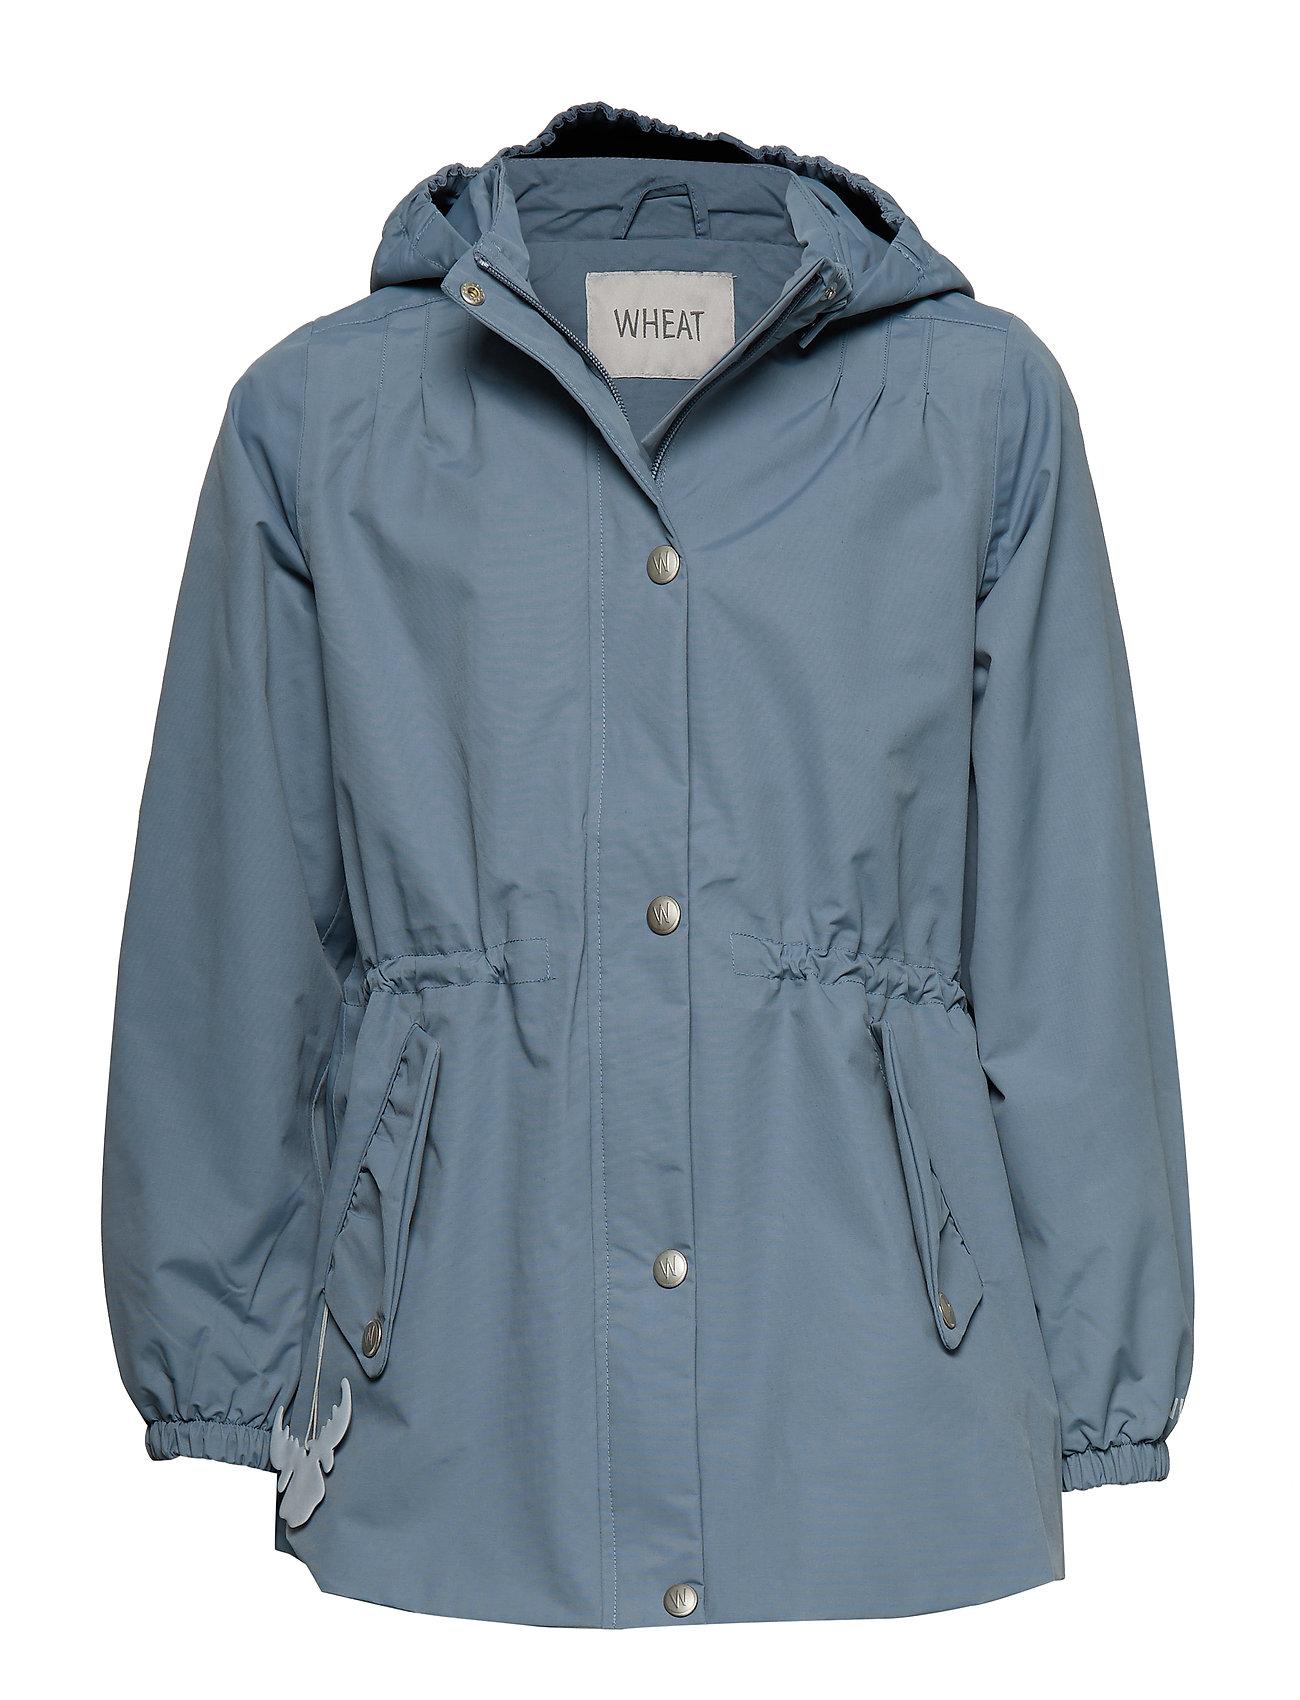 Wheat Jacket Cornelia - BLUE MIRAGE